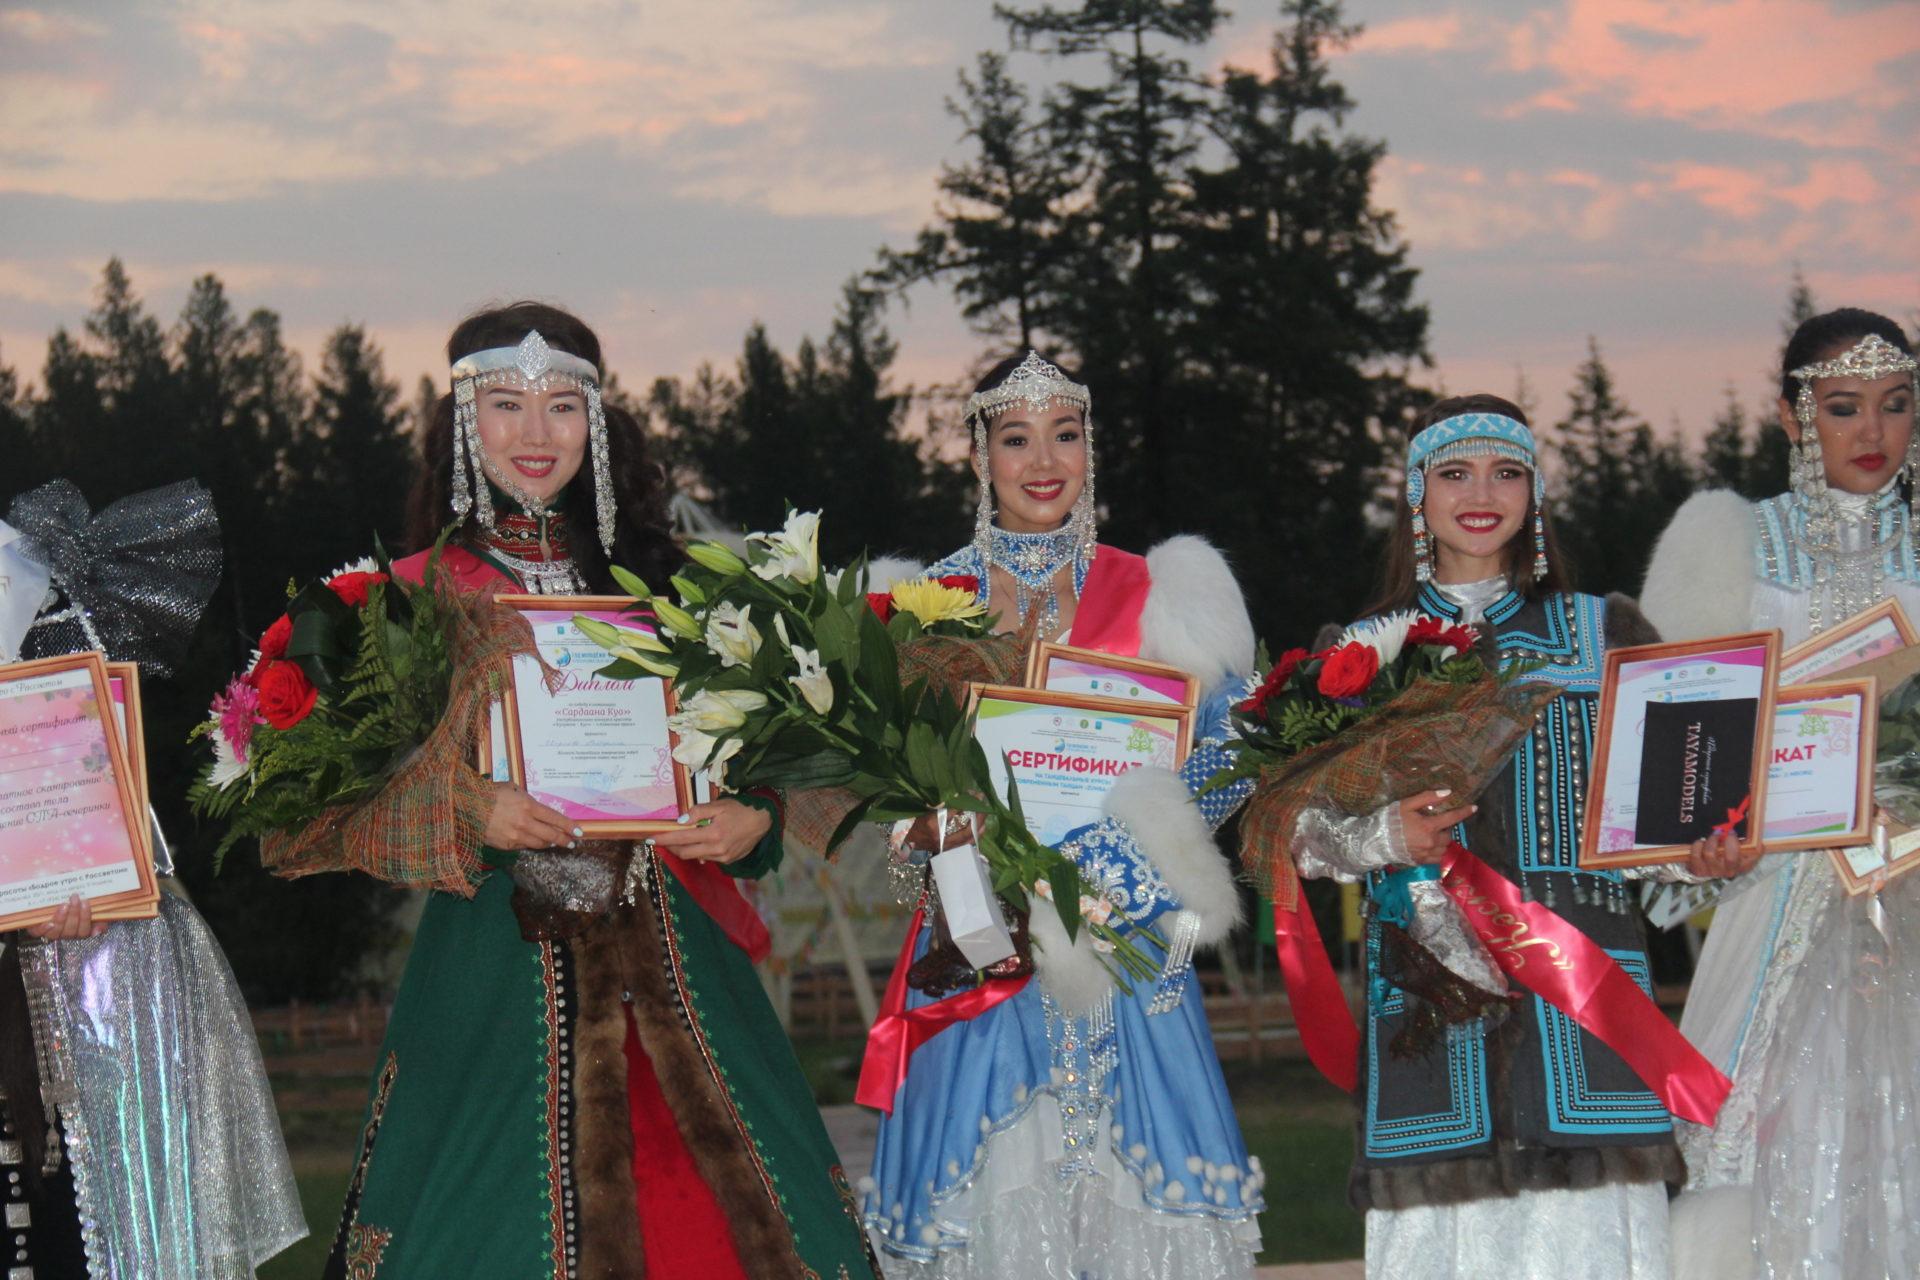 Самой красивой, талантливой девушкой молодежного ысыаха -2017 названа Алёна Ядреева